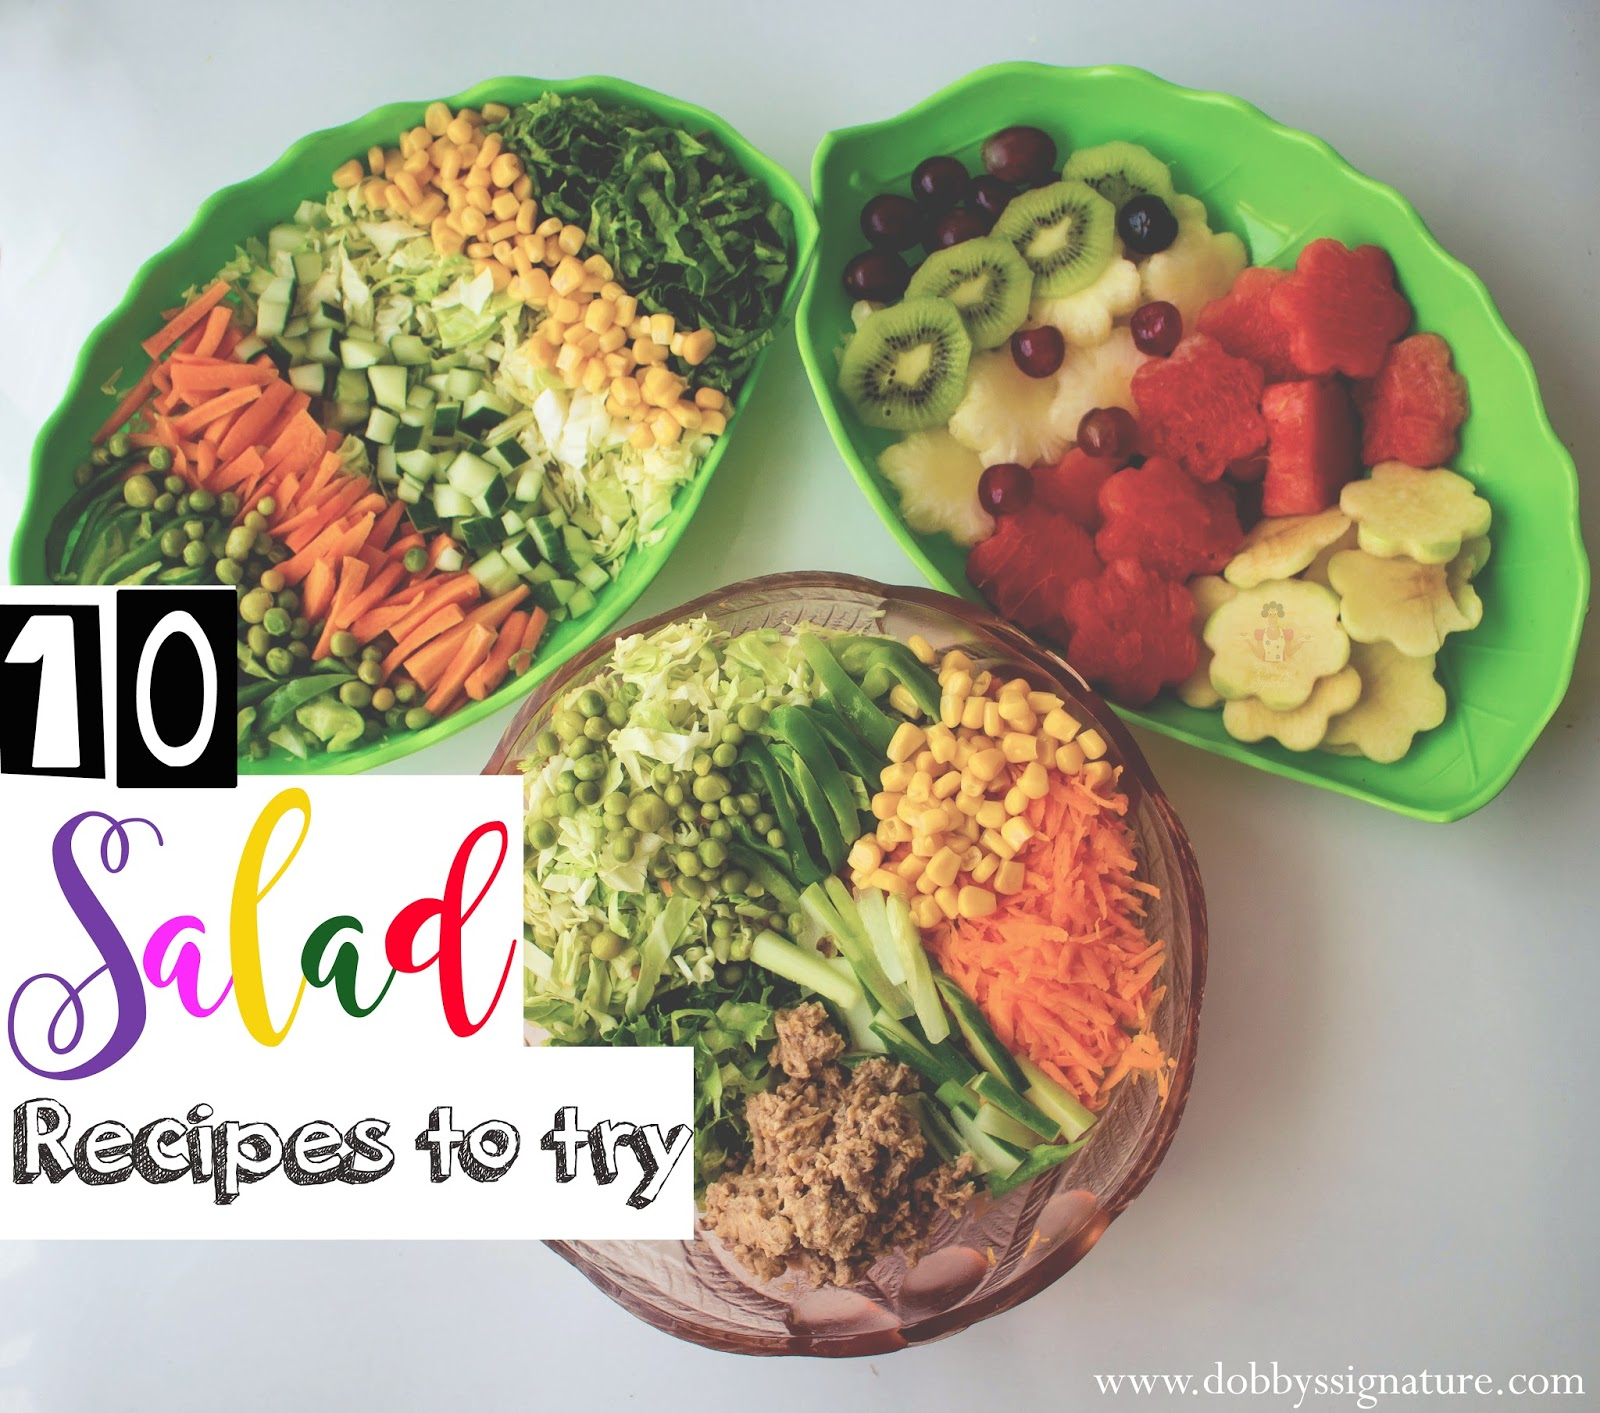 Dobbys signature nigerian food blog i nigerian food recipes i 10 salad recipes to try forumfinder Gallery